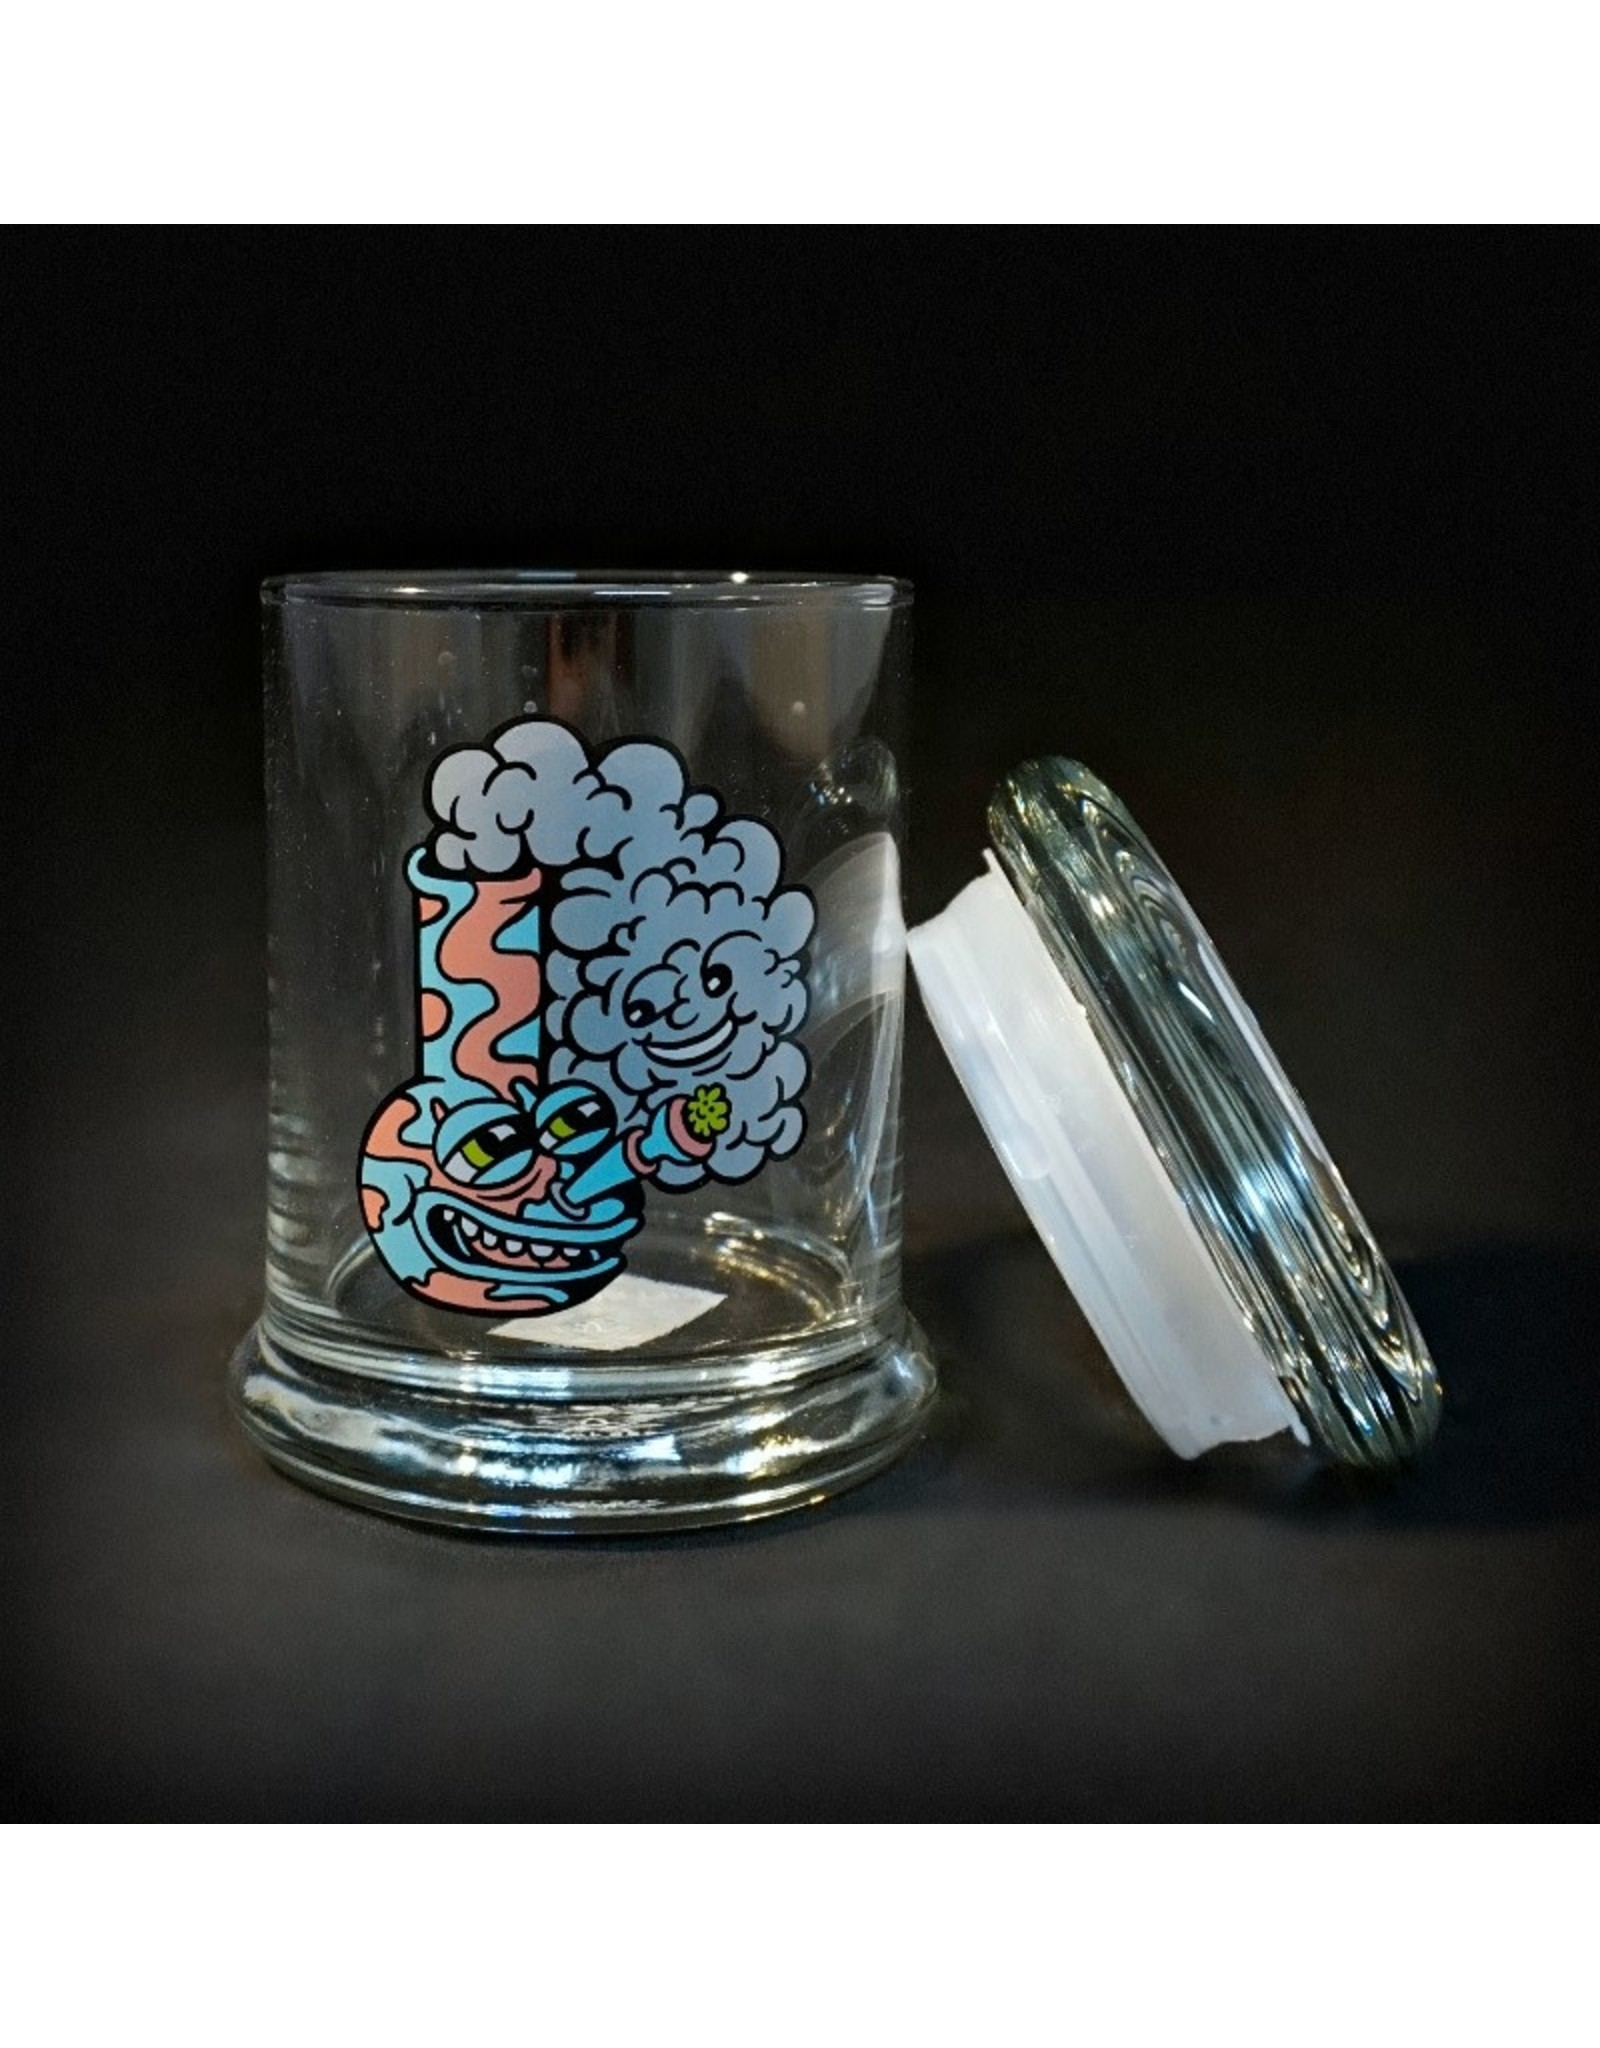 420 Science 420 Science Jars Medium Happy Bong Pop Top